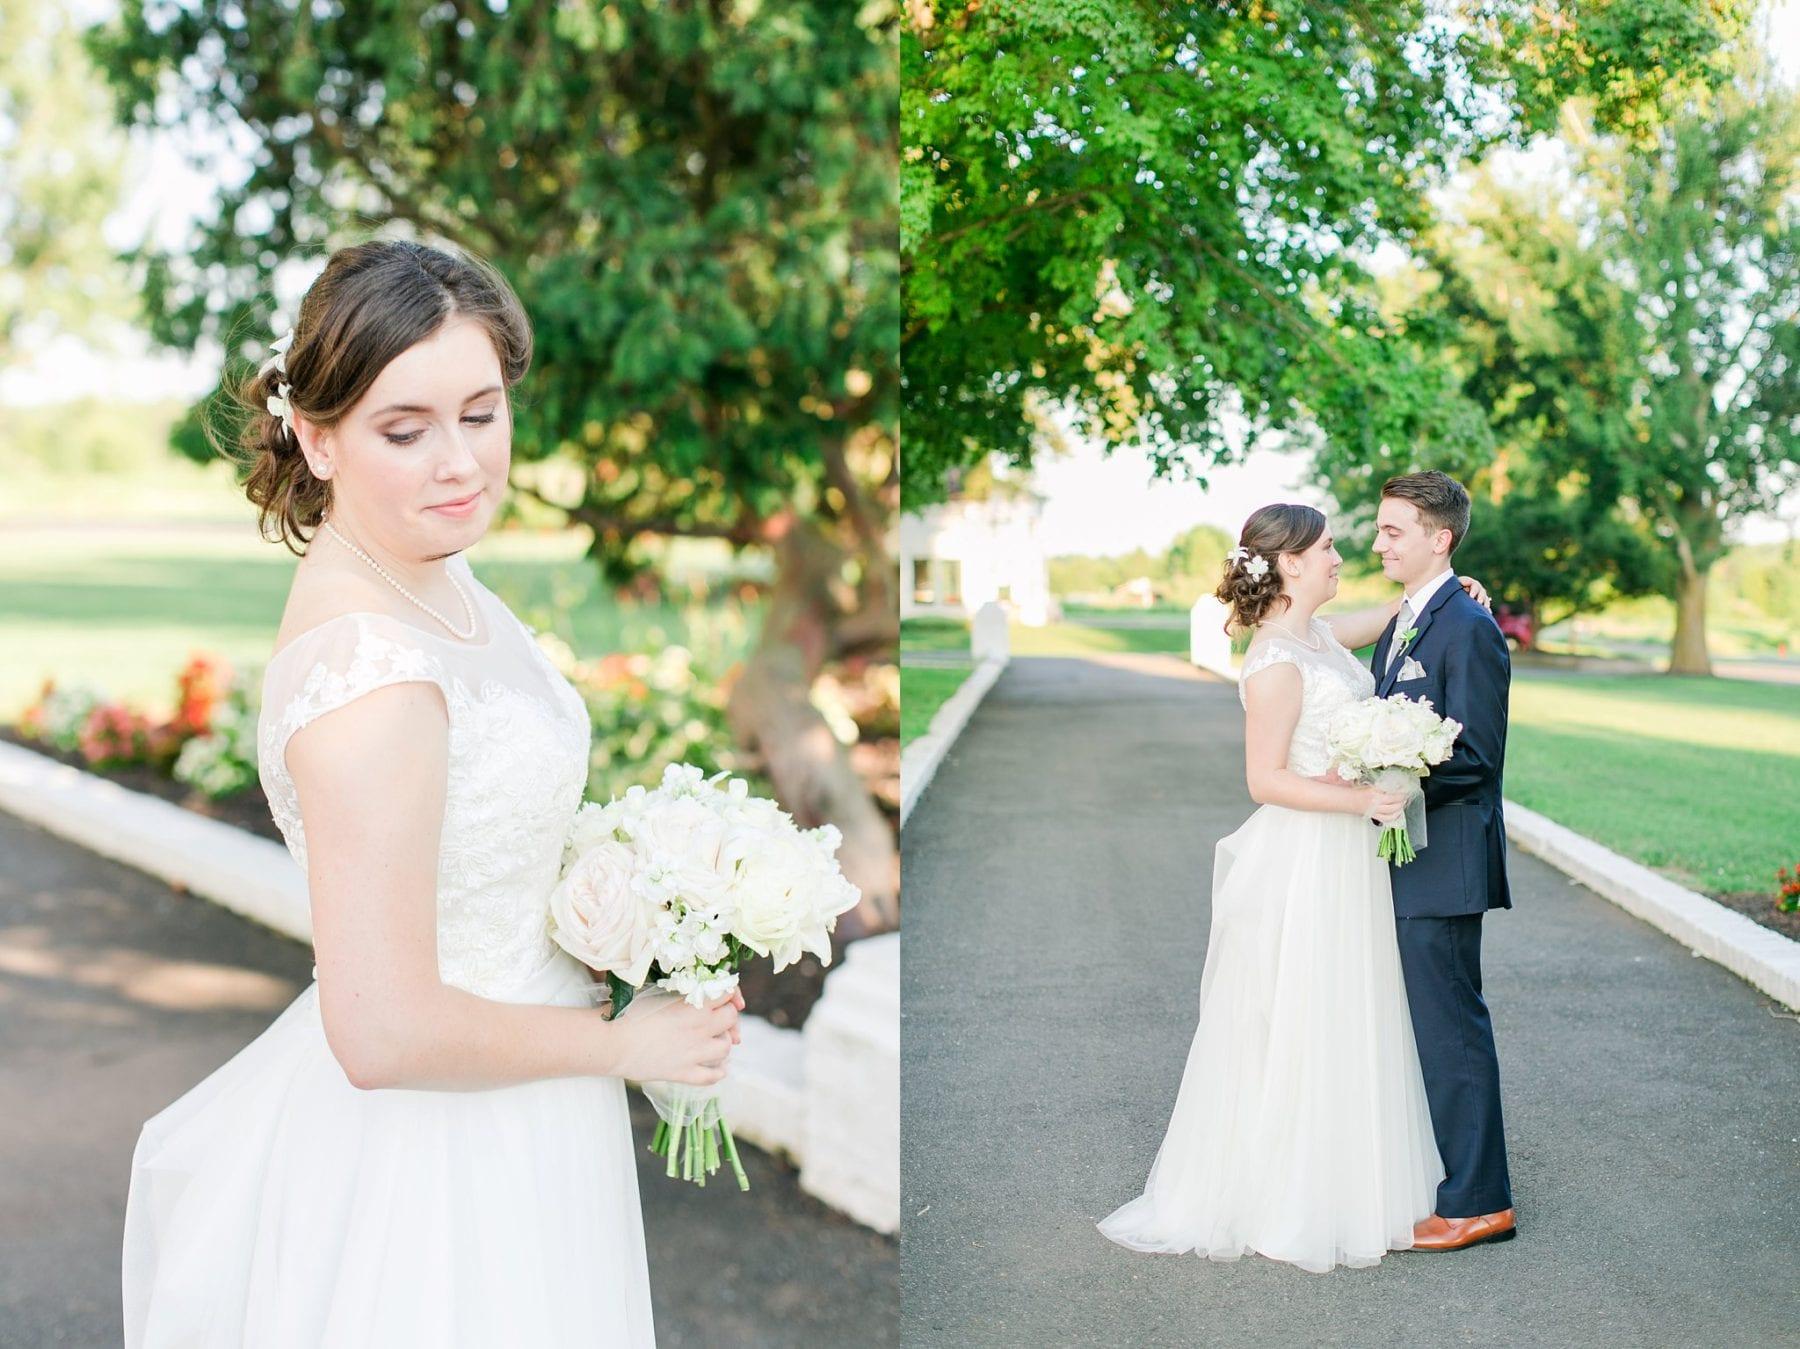 Bristow Manor Wedding Photos Virginia Wedding Photographer Lauren & Andrew Megan Kelsey Photography-506.jpg